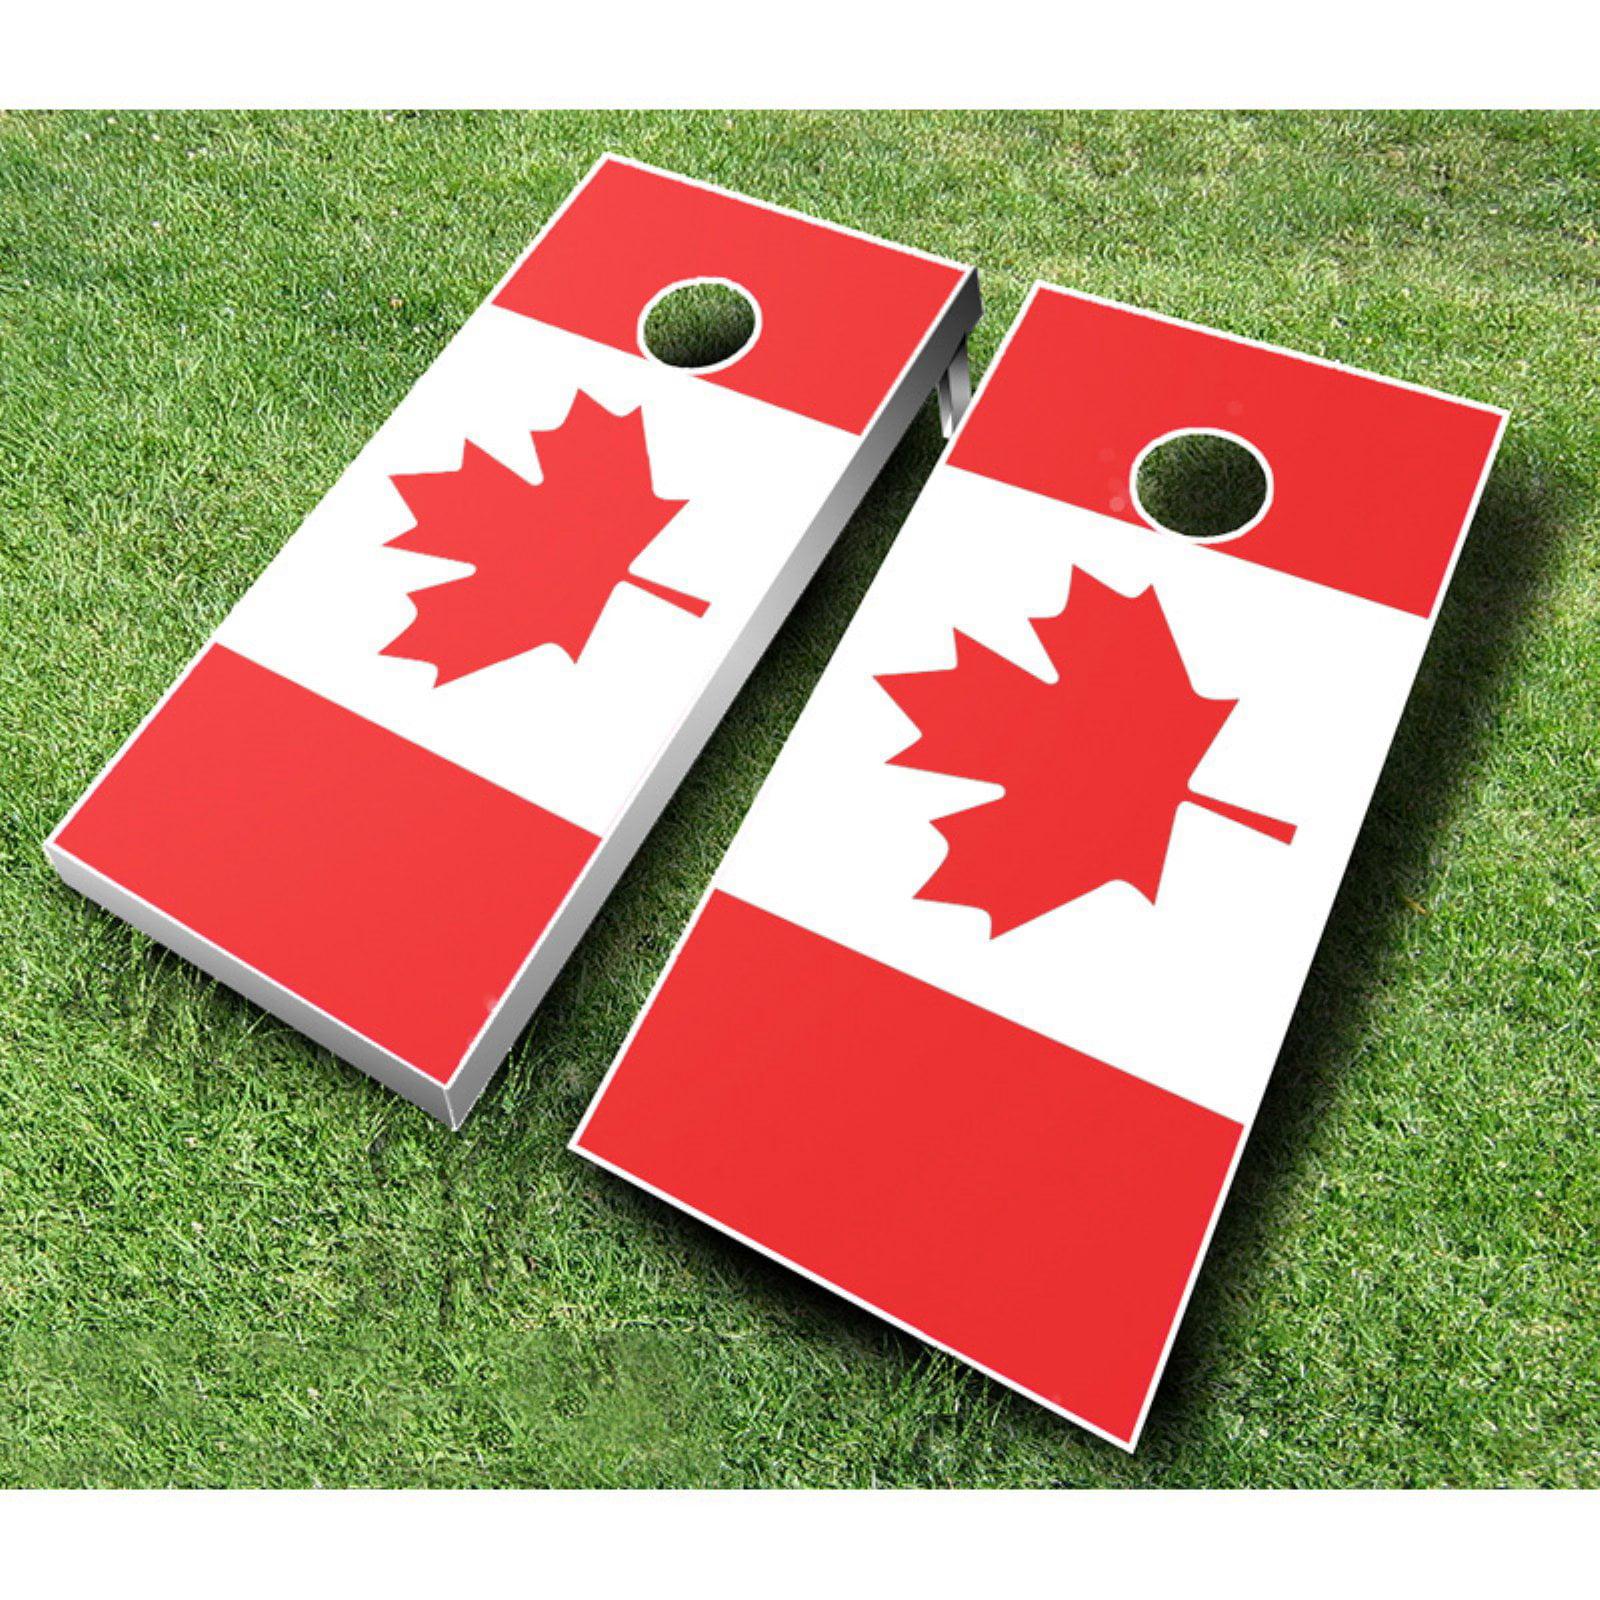 Canadian Flag Tournament Cornhole Set by AJJ Cornhole